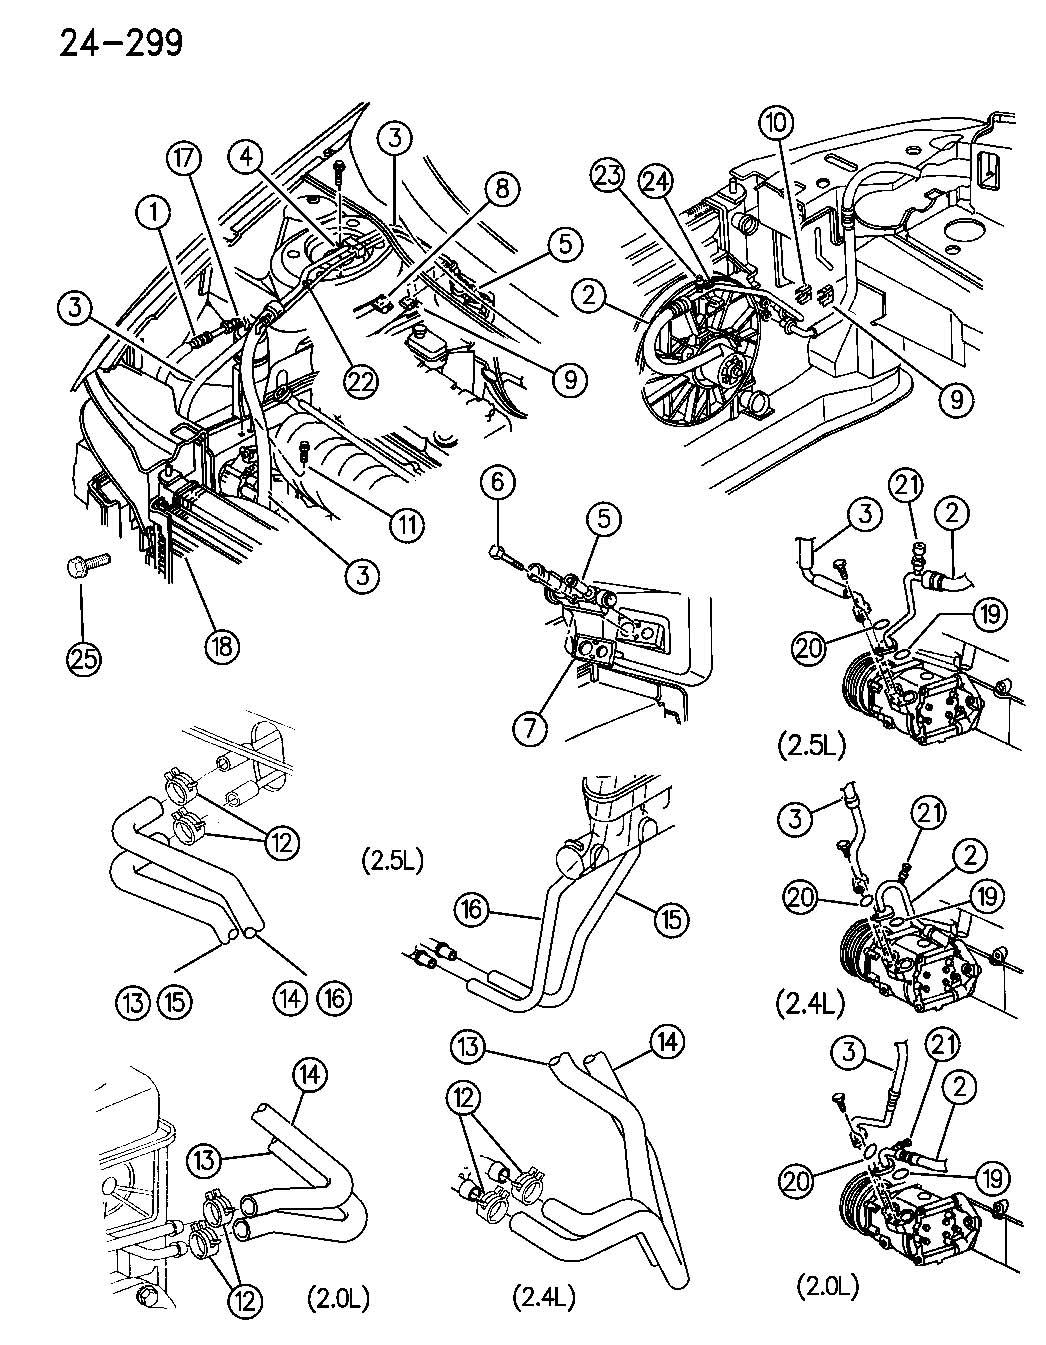 2001 audi tt serpentine belt diagram 1999 isuzu amigo wiring diagram at ww5 sssssssssssssssssddddsssssssssssss